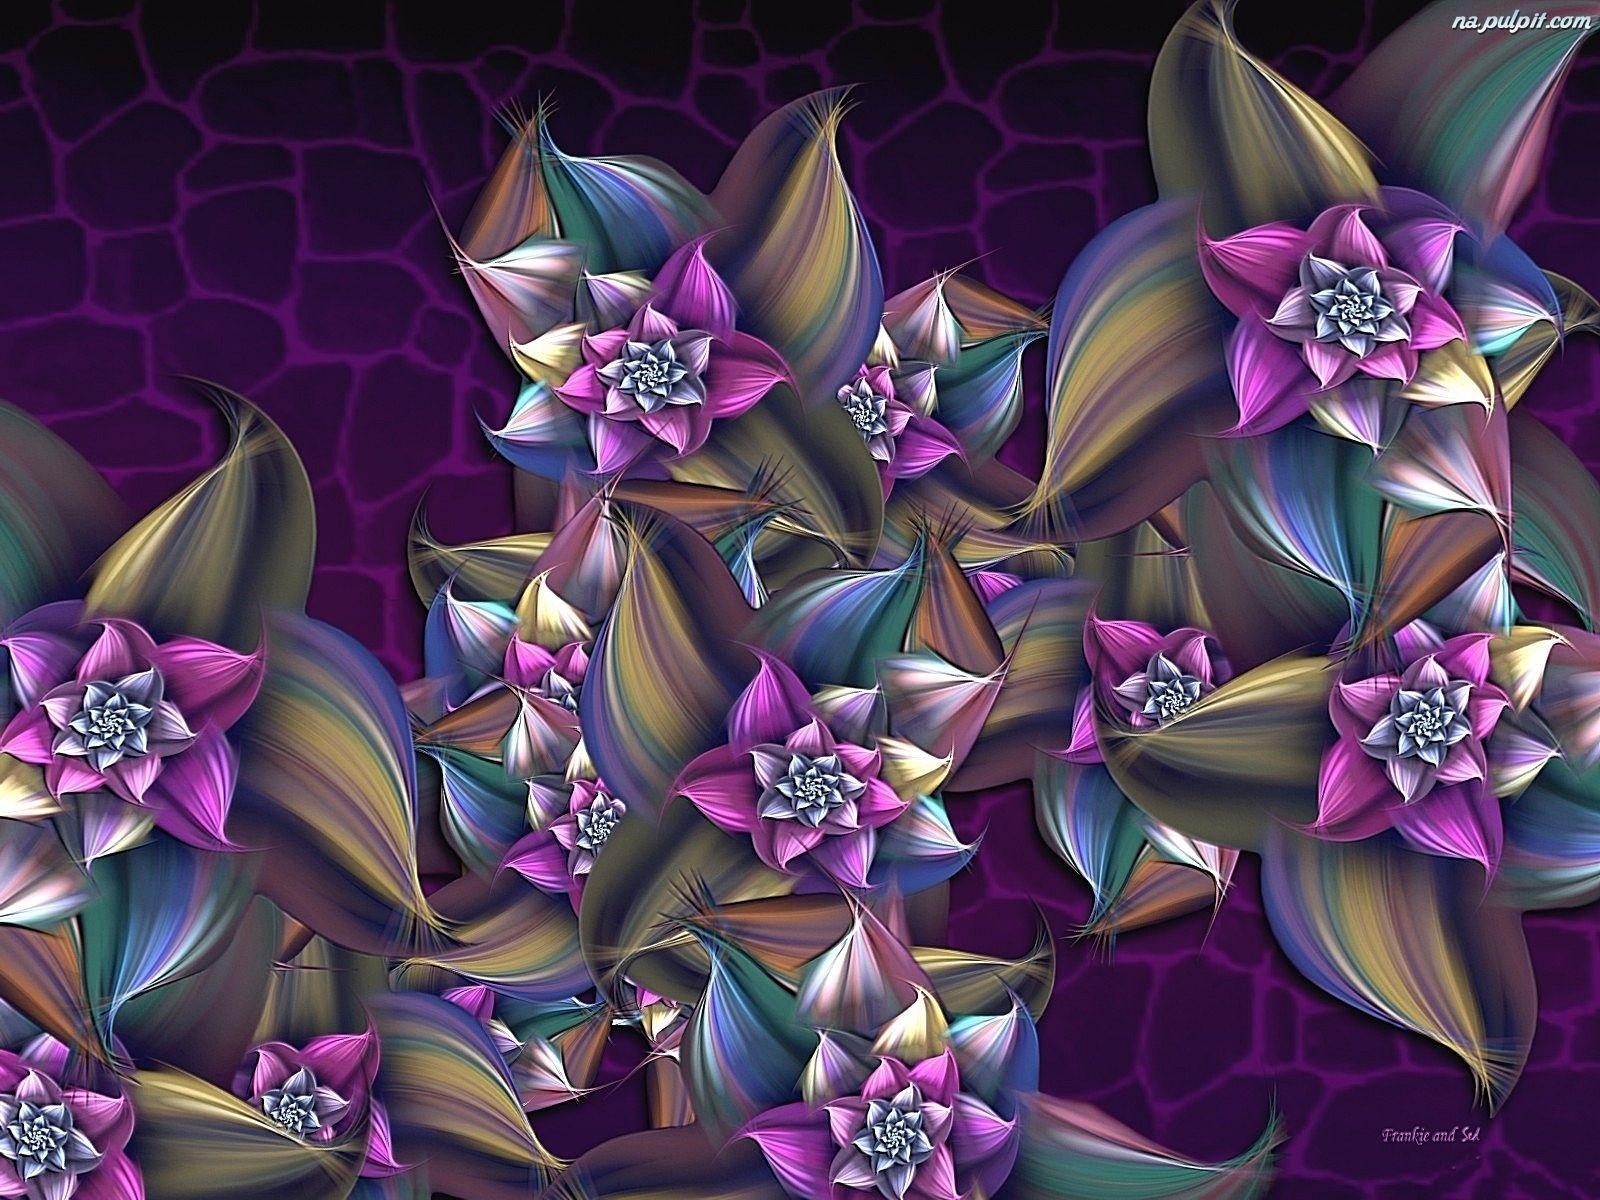 Grafika Kwiaty Fioletowe Fraktal Fractals Wallpaper Crown Jewelry